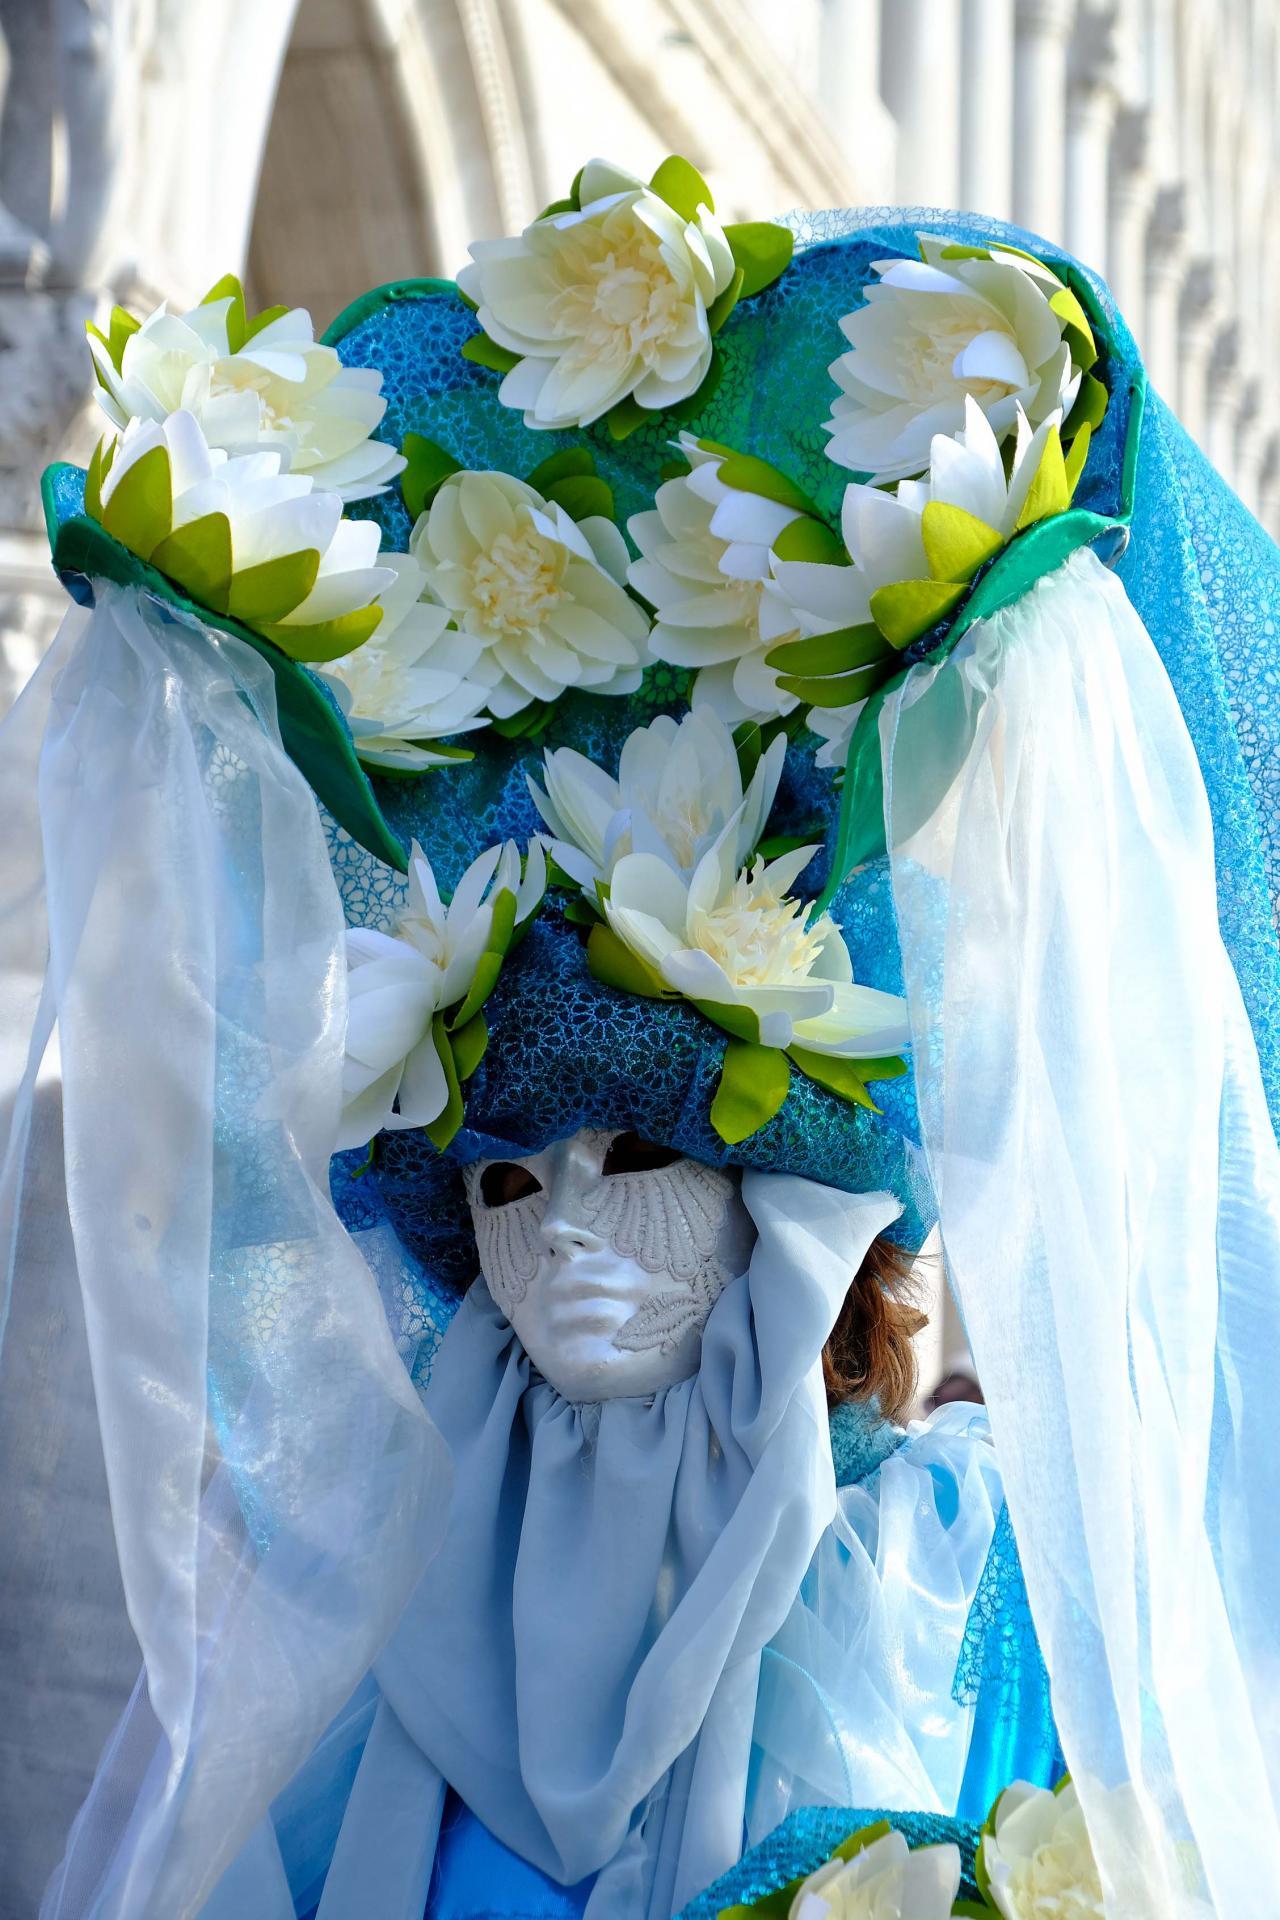 Venise carnaval 511 1